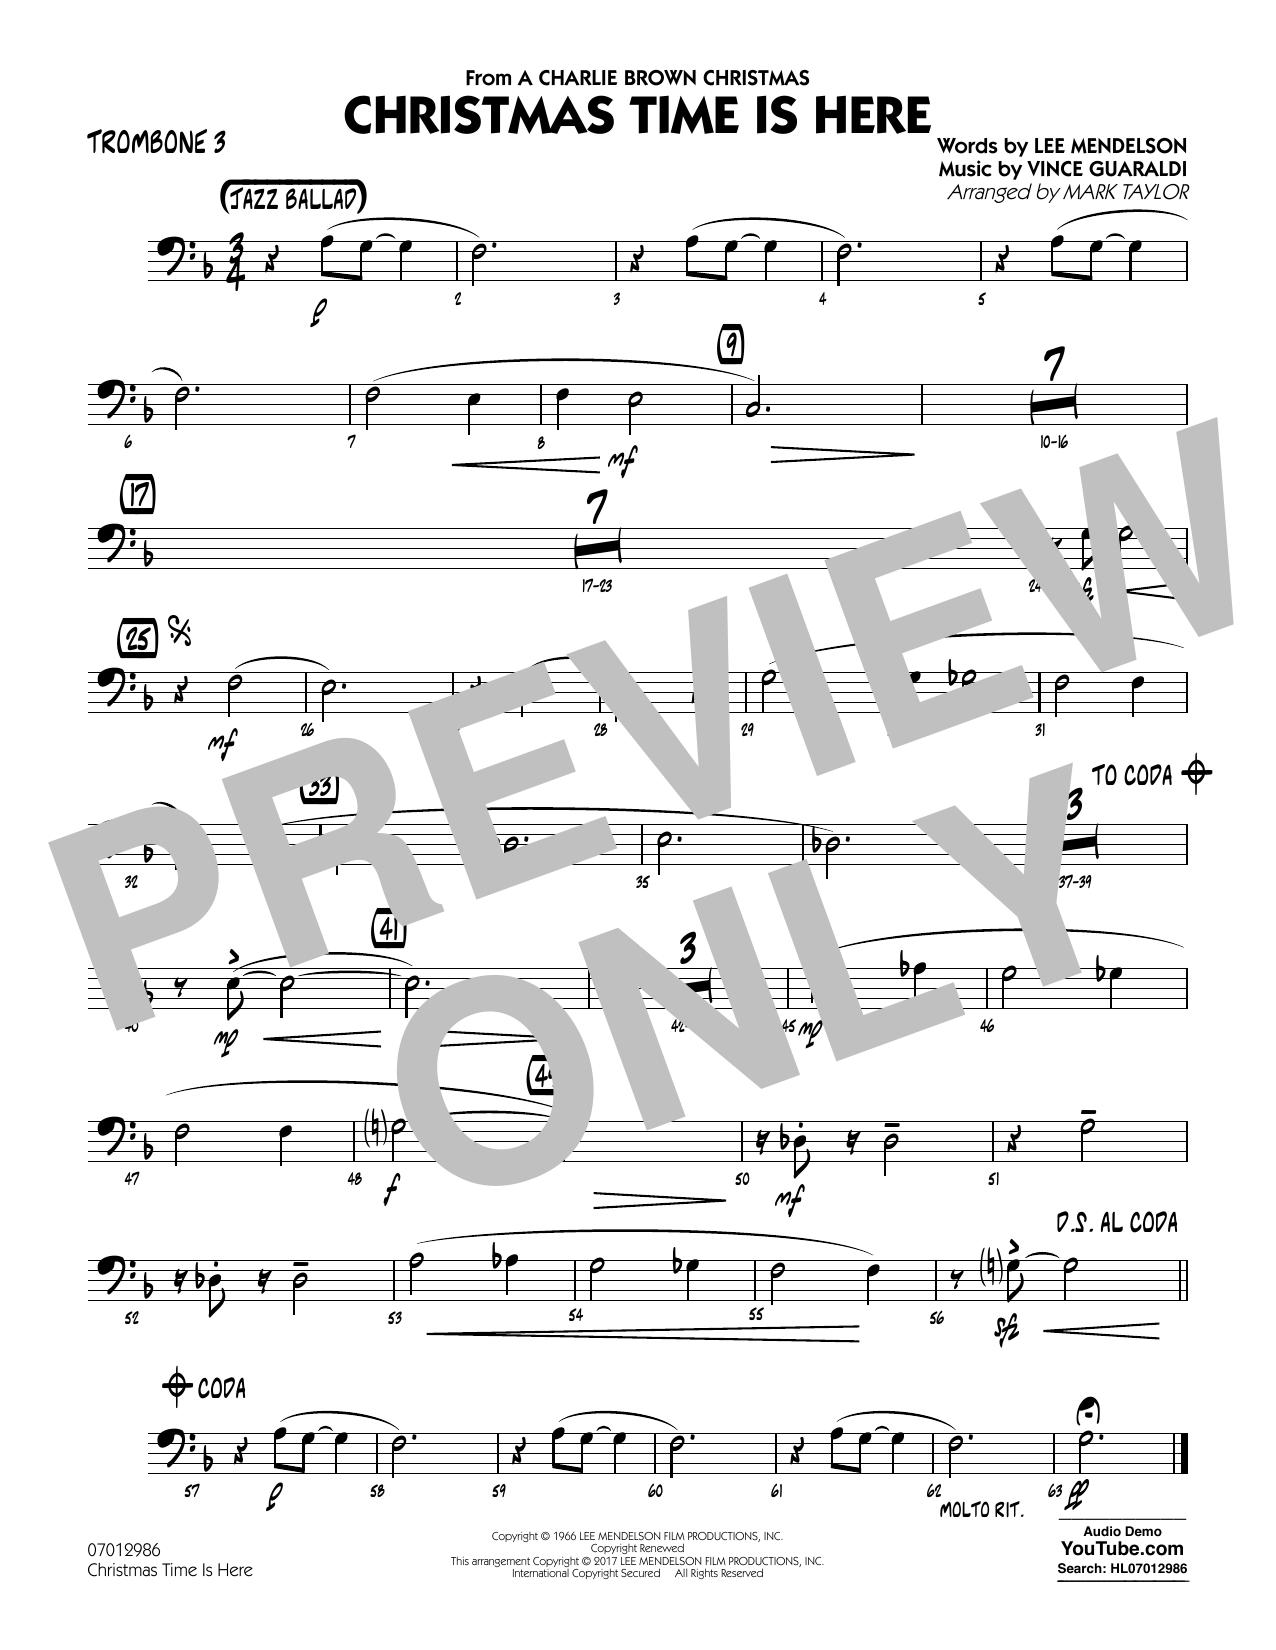 Christmas Time Is Here - Trombone 3 Sheet Music